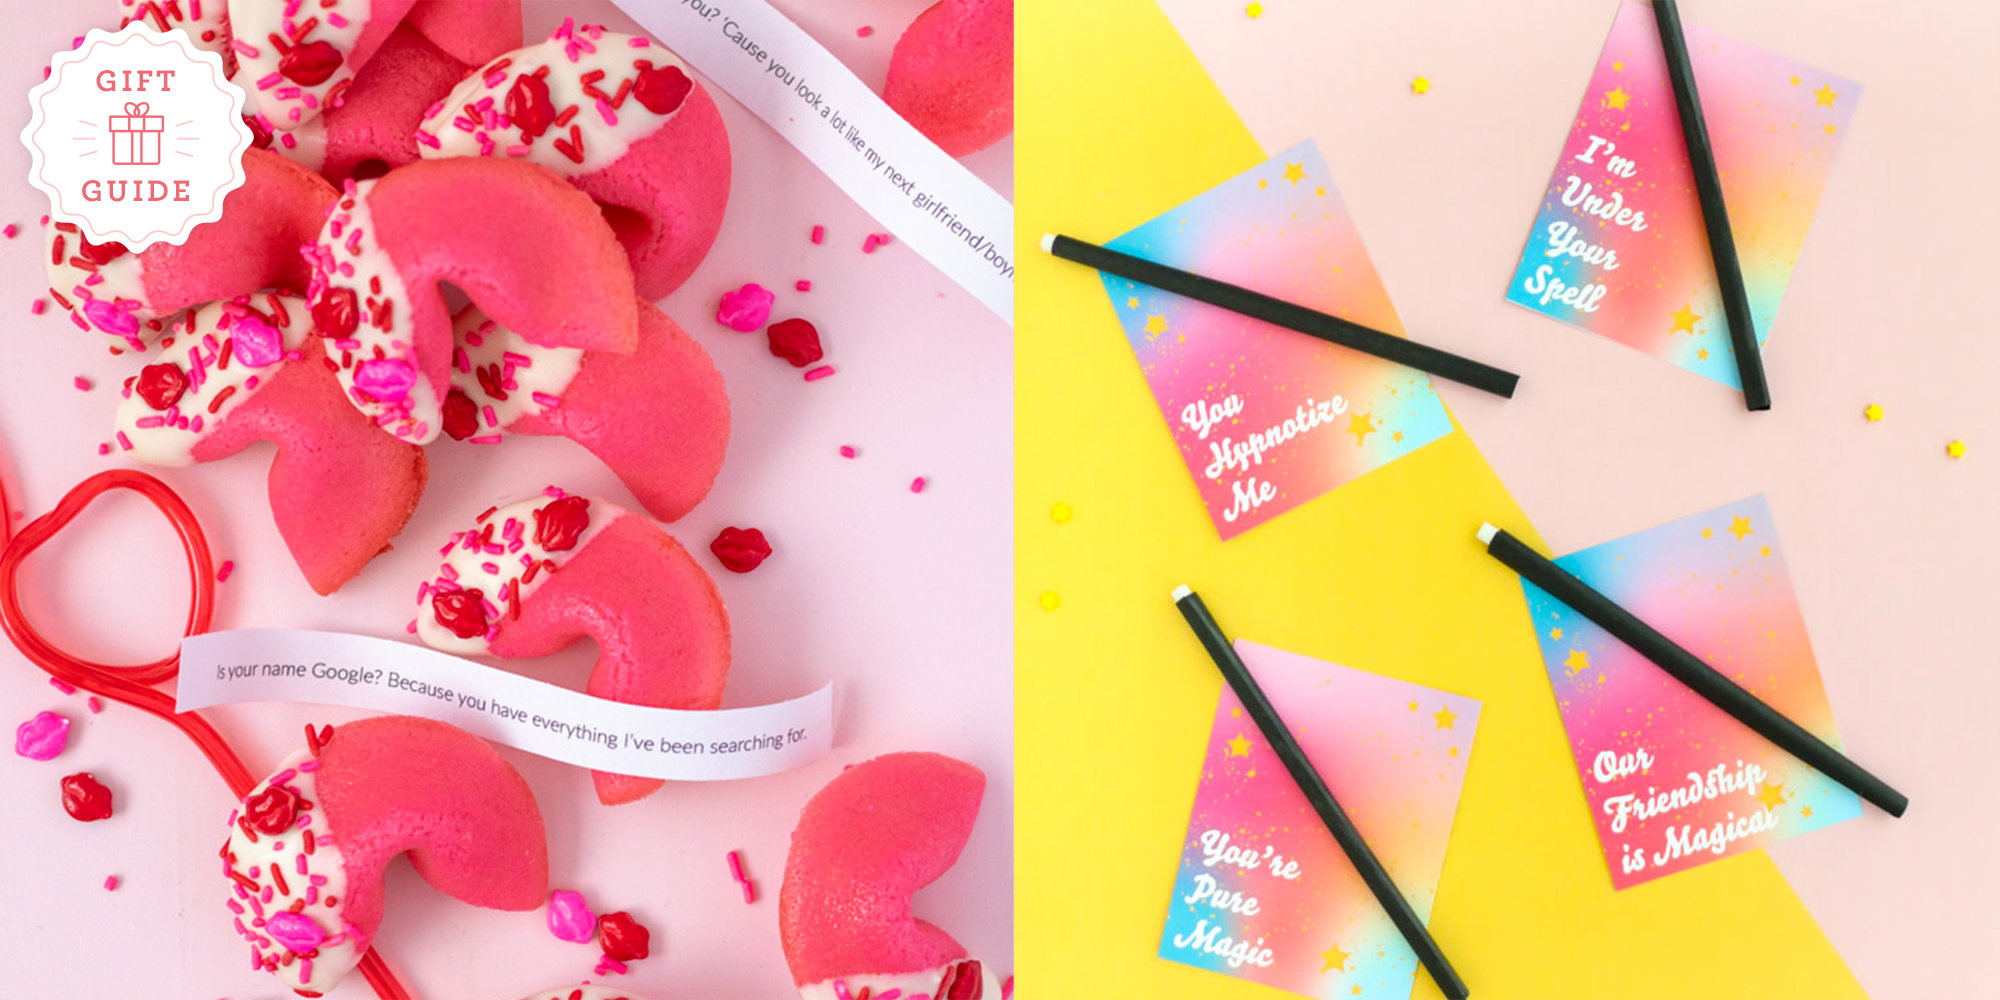 32 Diy Valentine S Day Gift Ideas Easy Homemade Valentine S Day